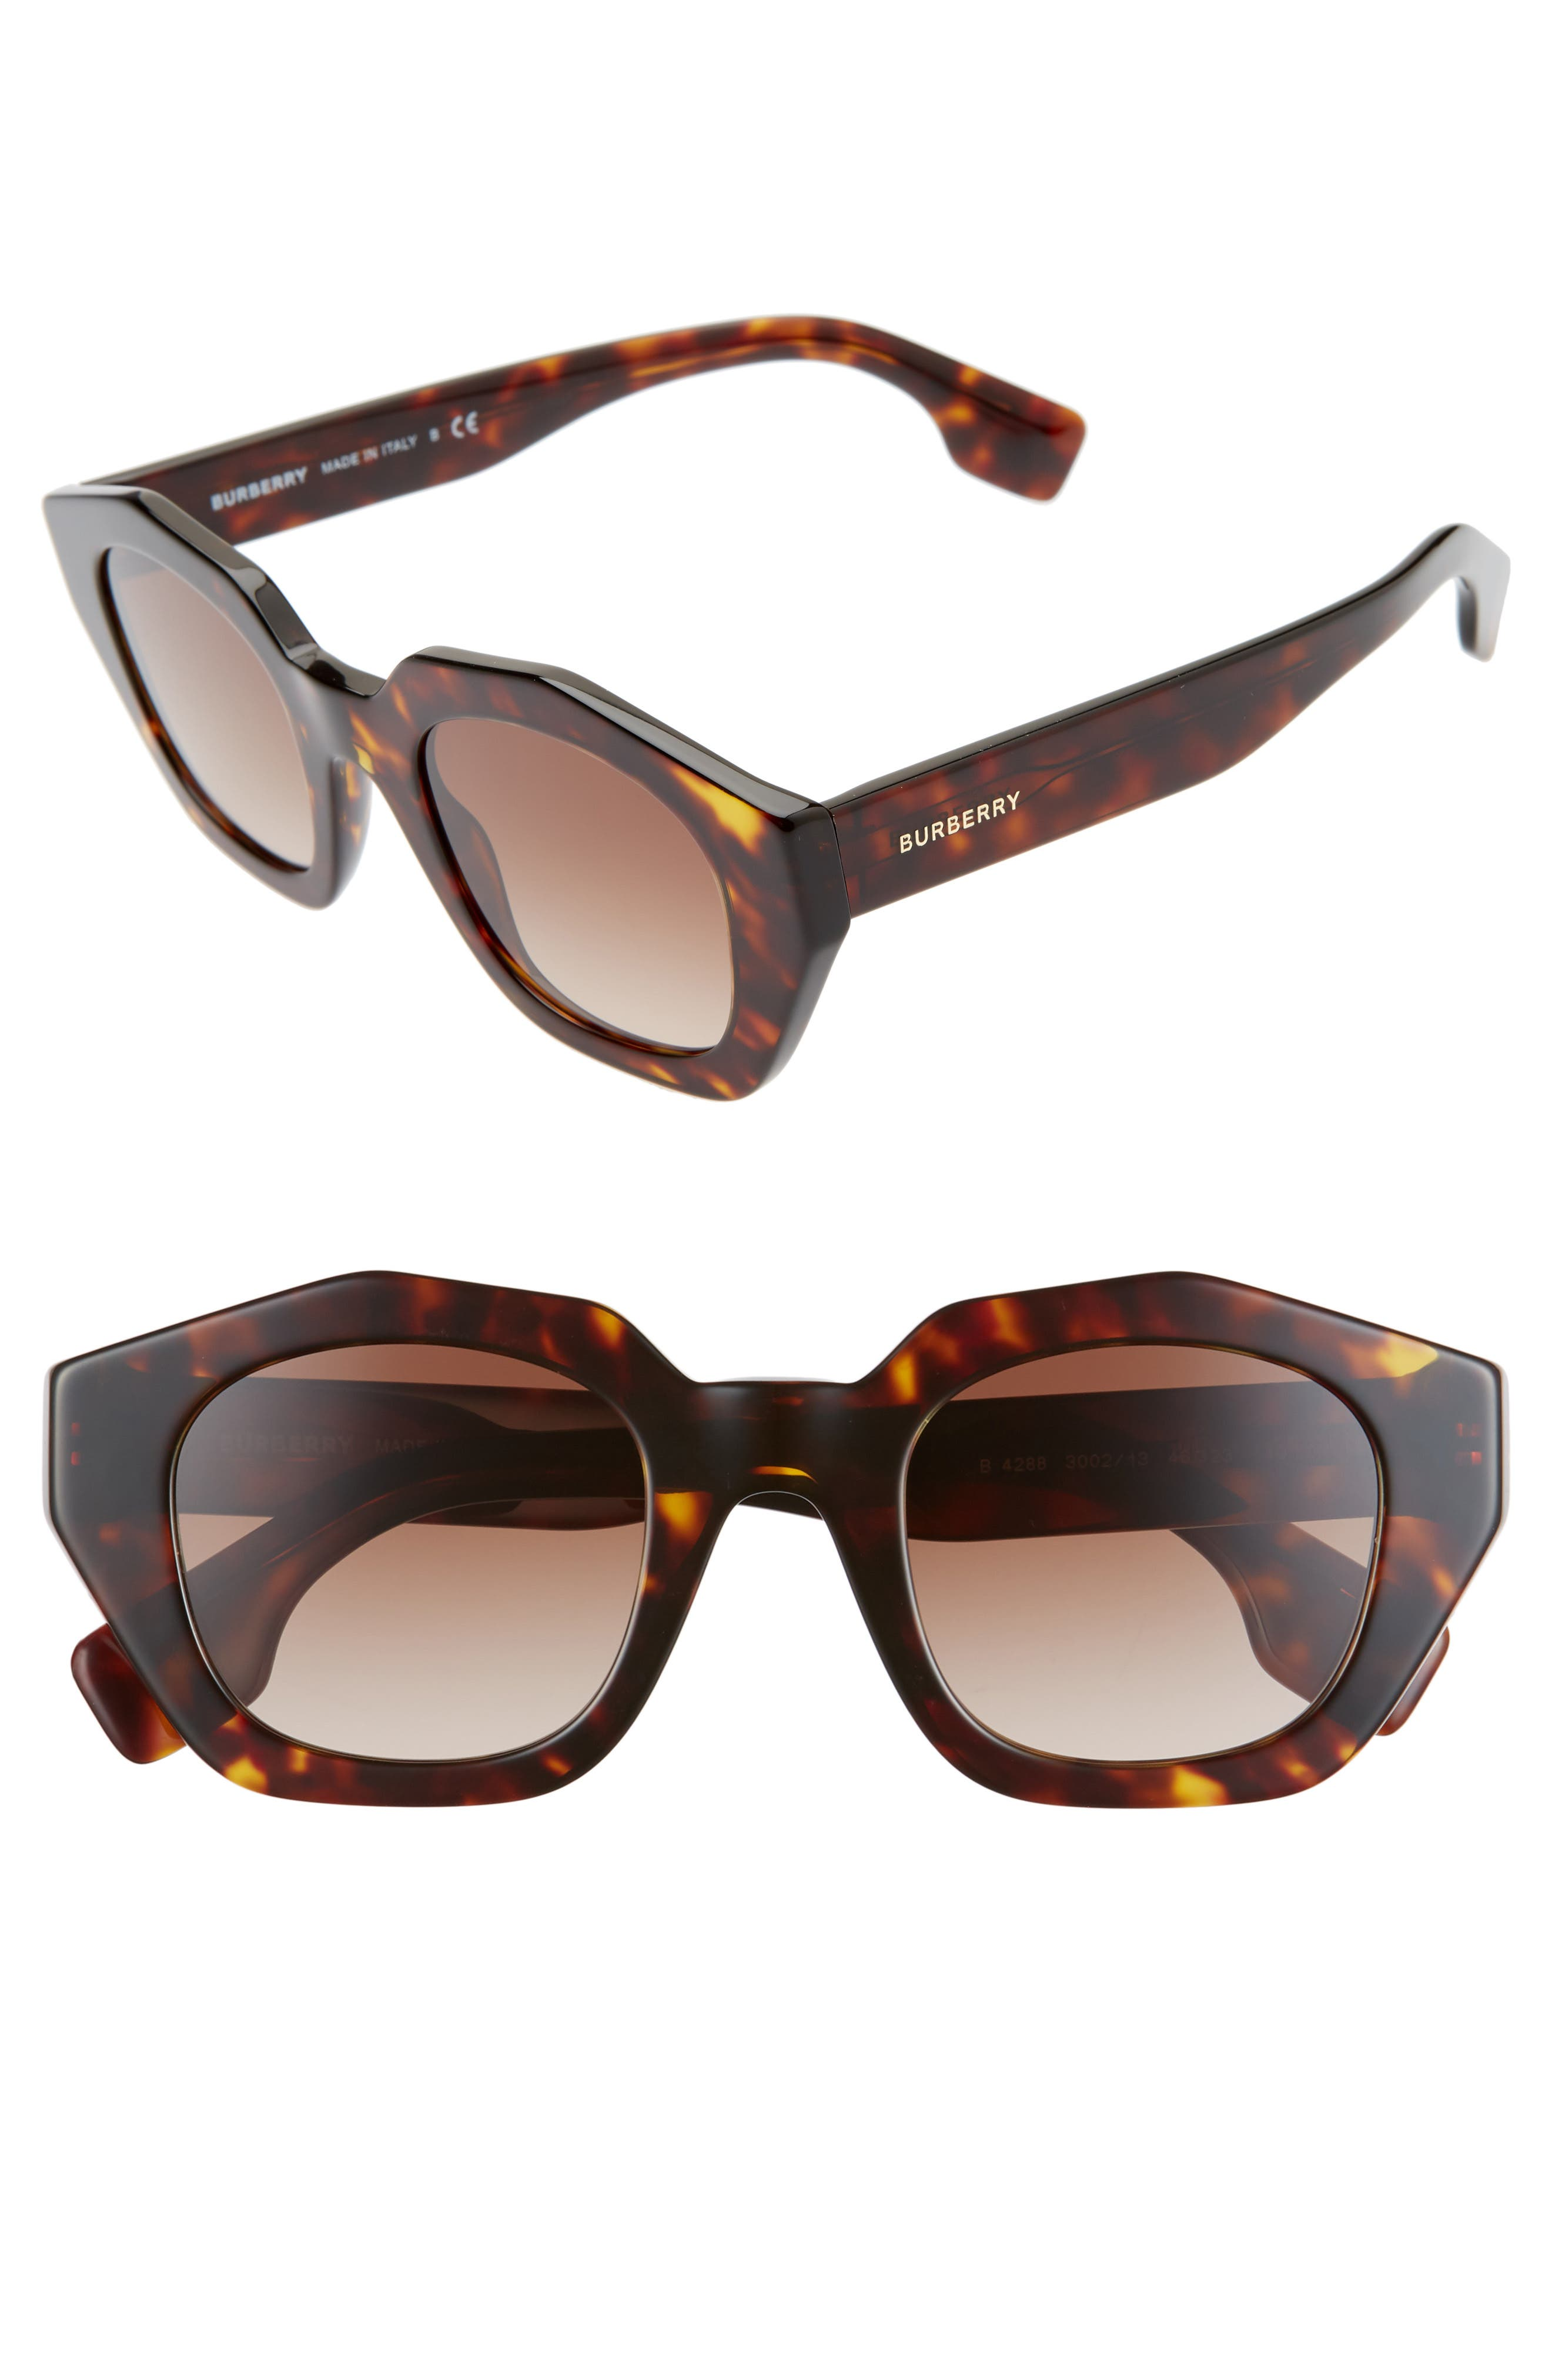 b503a789f4d4 Burberry Sunglasses for Women   Nordstrom